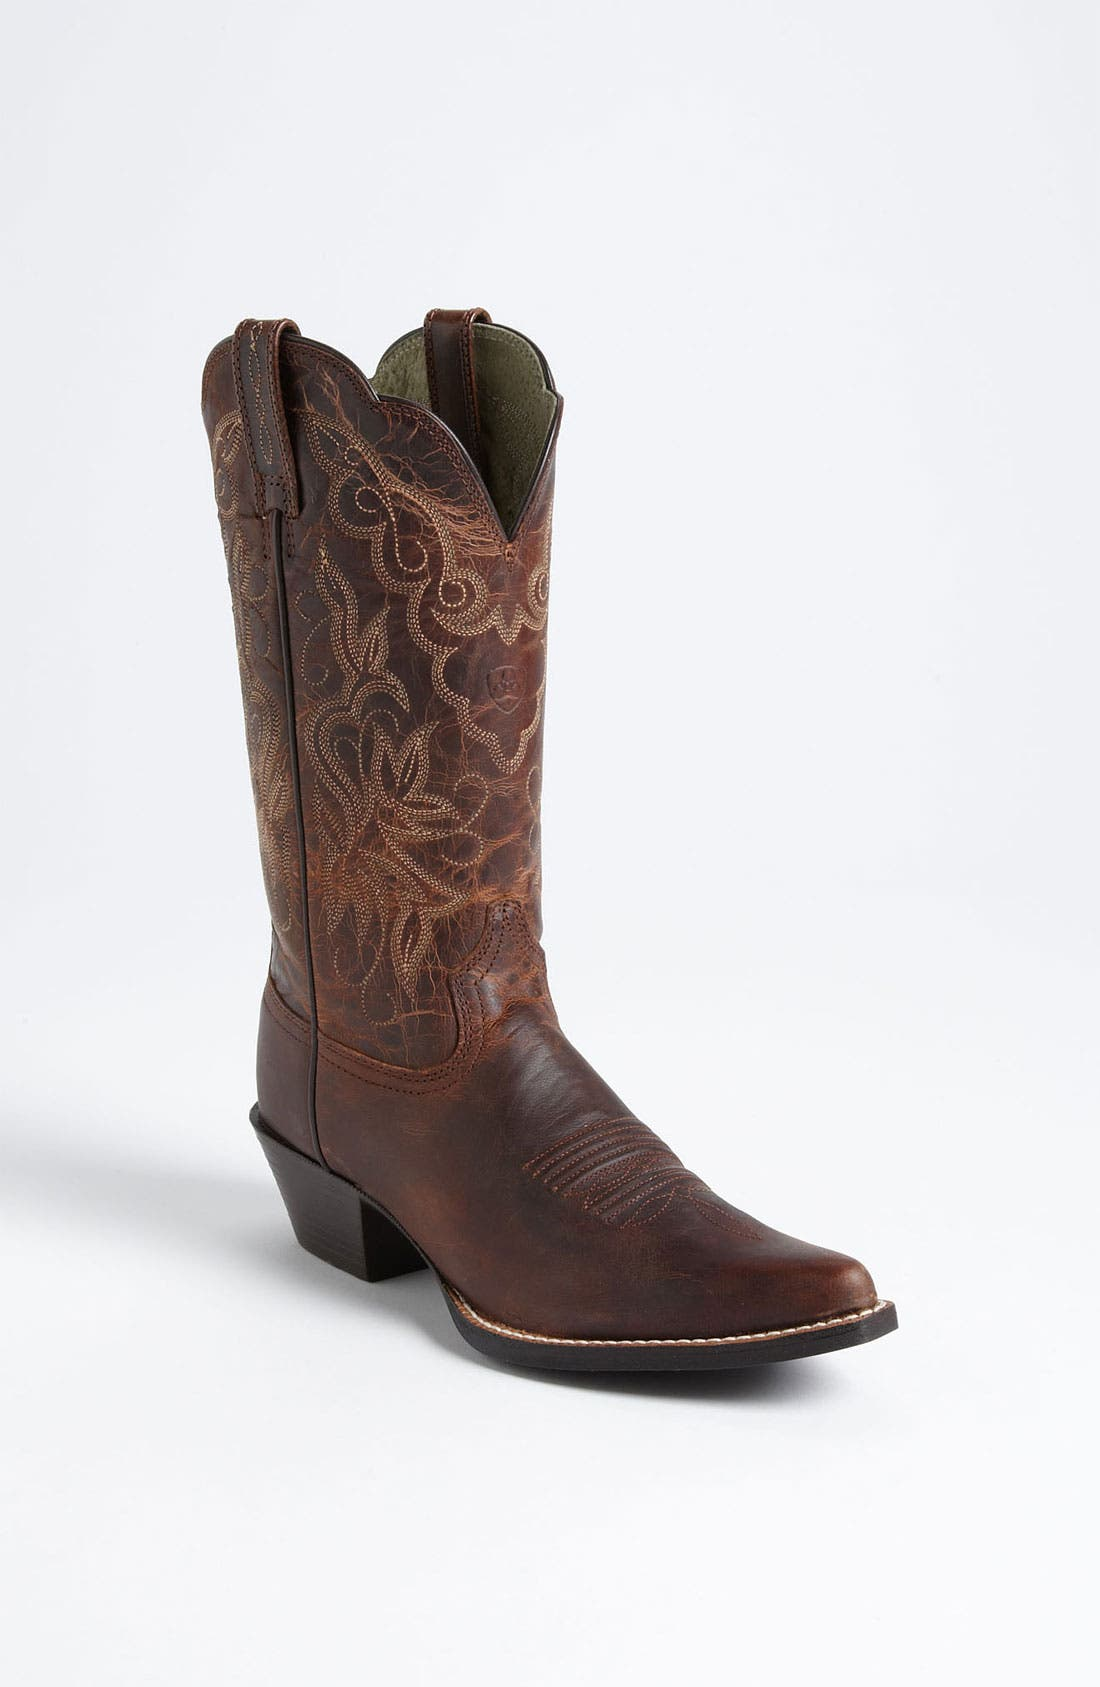 Alternate Image 1 Selected - Ariat 'Heritage Western J Toe' Boot